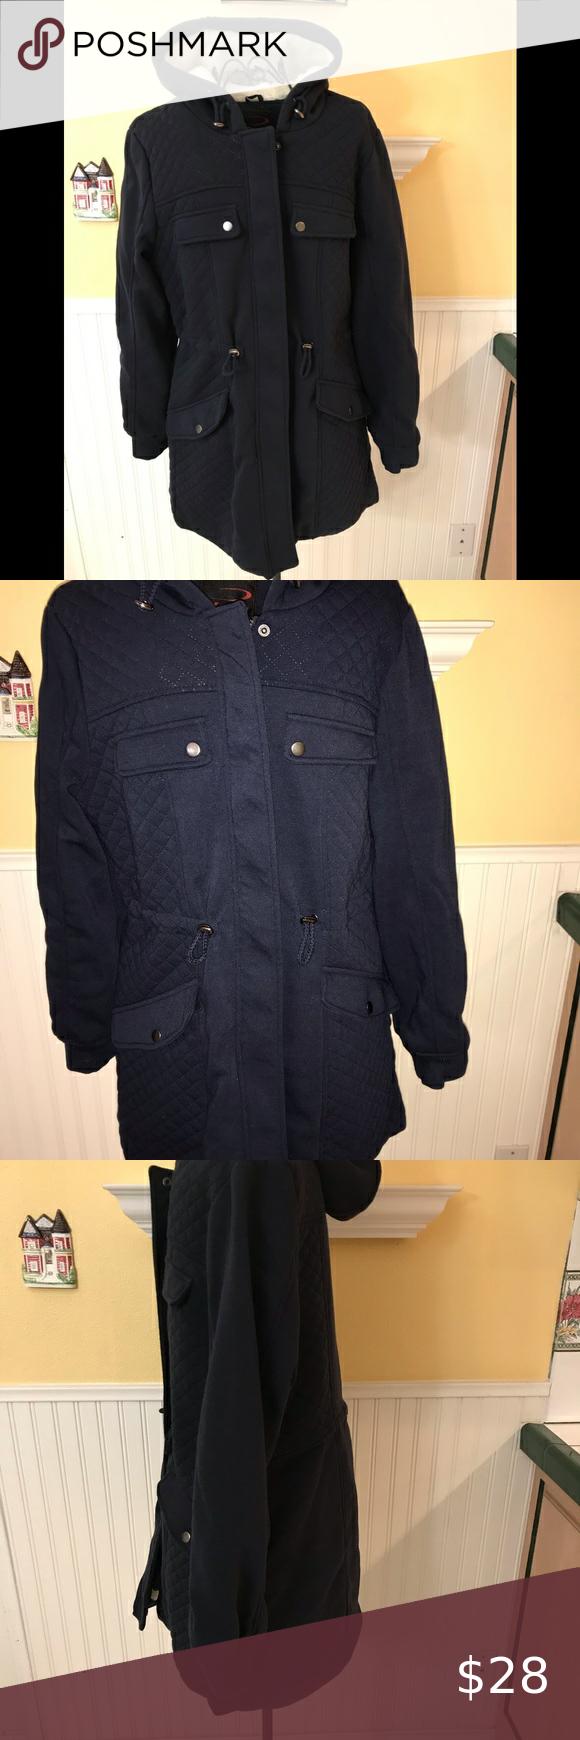 Yoki Outerwear Collection Warm Lined Coat Hood Szl Hooded Coat Outerwear Yoki [ 1740 x 580 Pixel ]